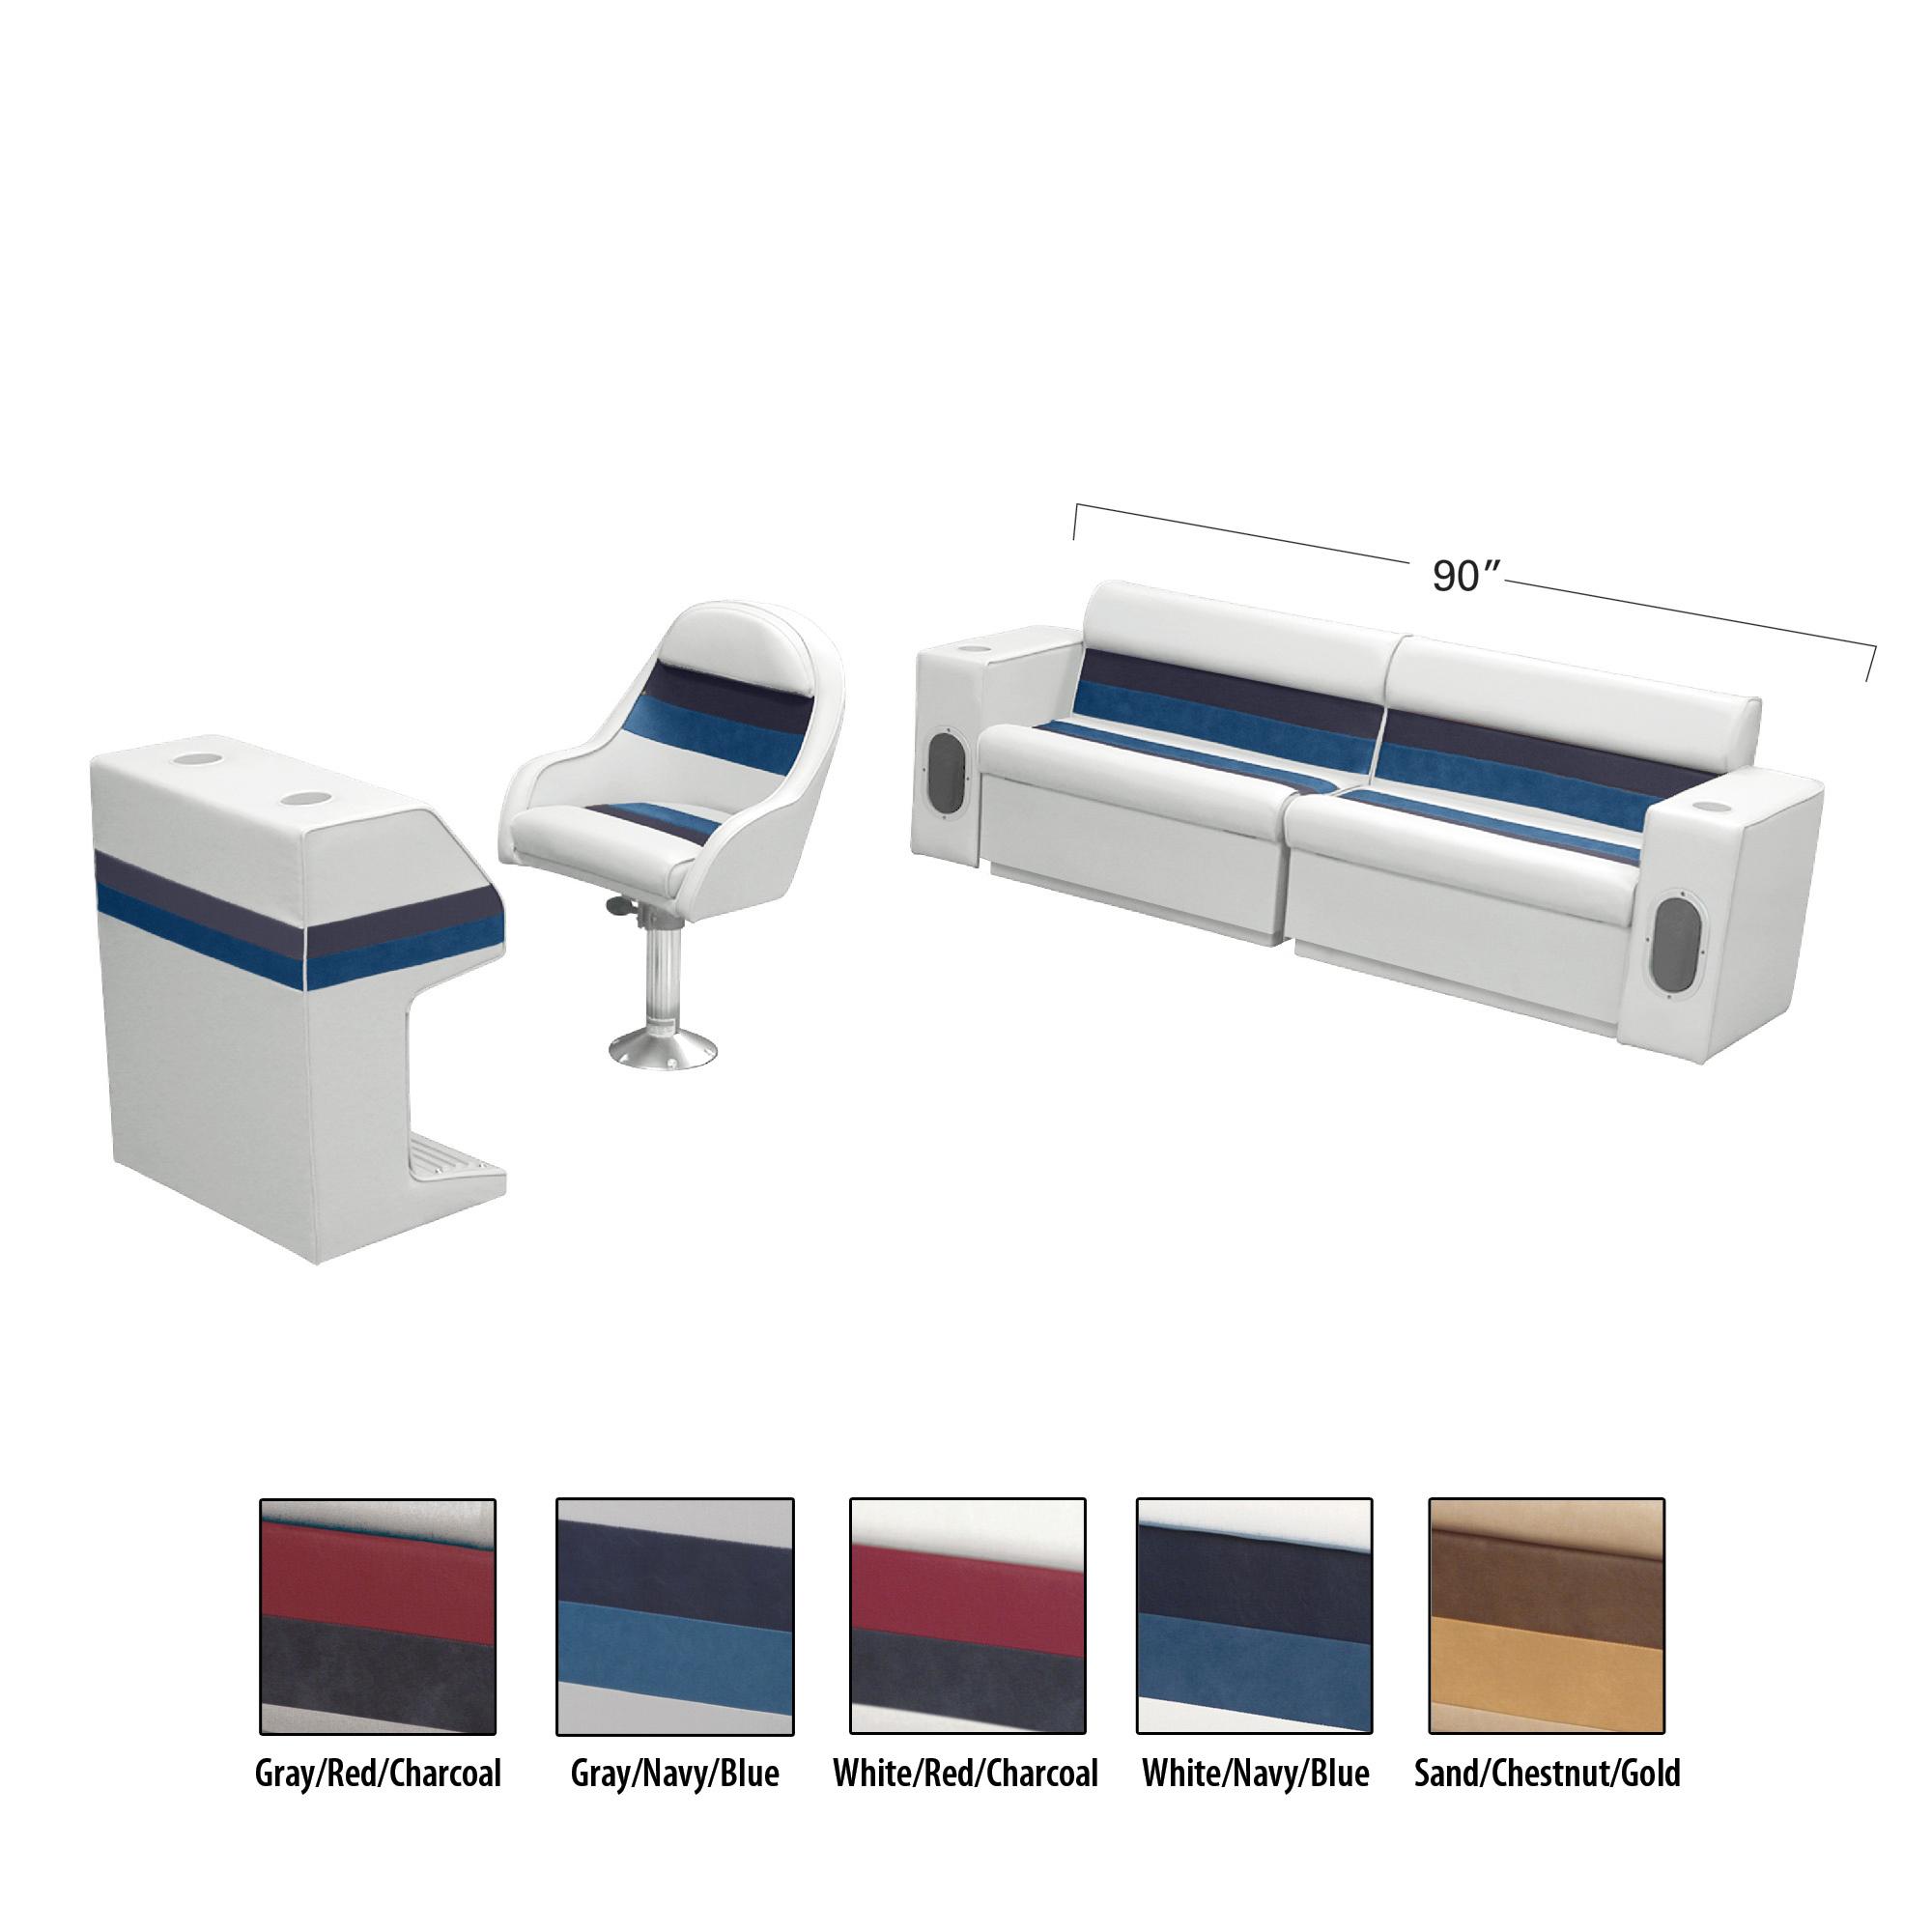 Deluxe Pontoon Furniture w/Toe Kick Base - Rear Basic Package, White/Navy/Blue